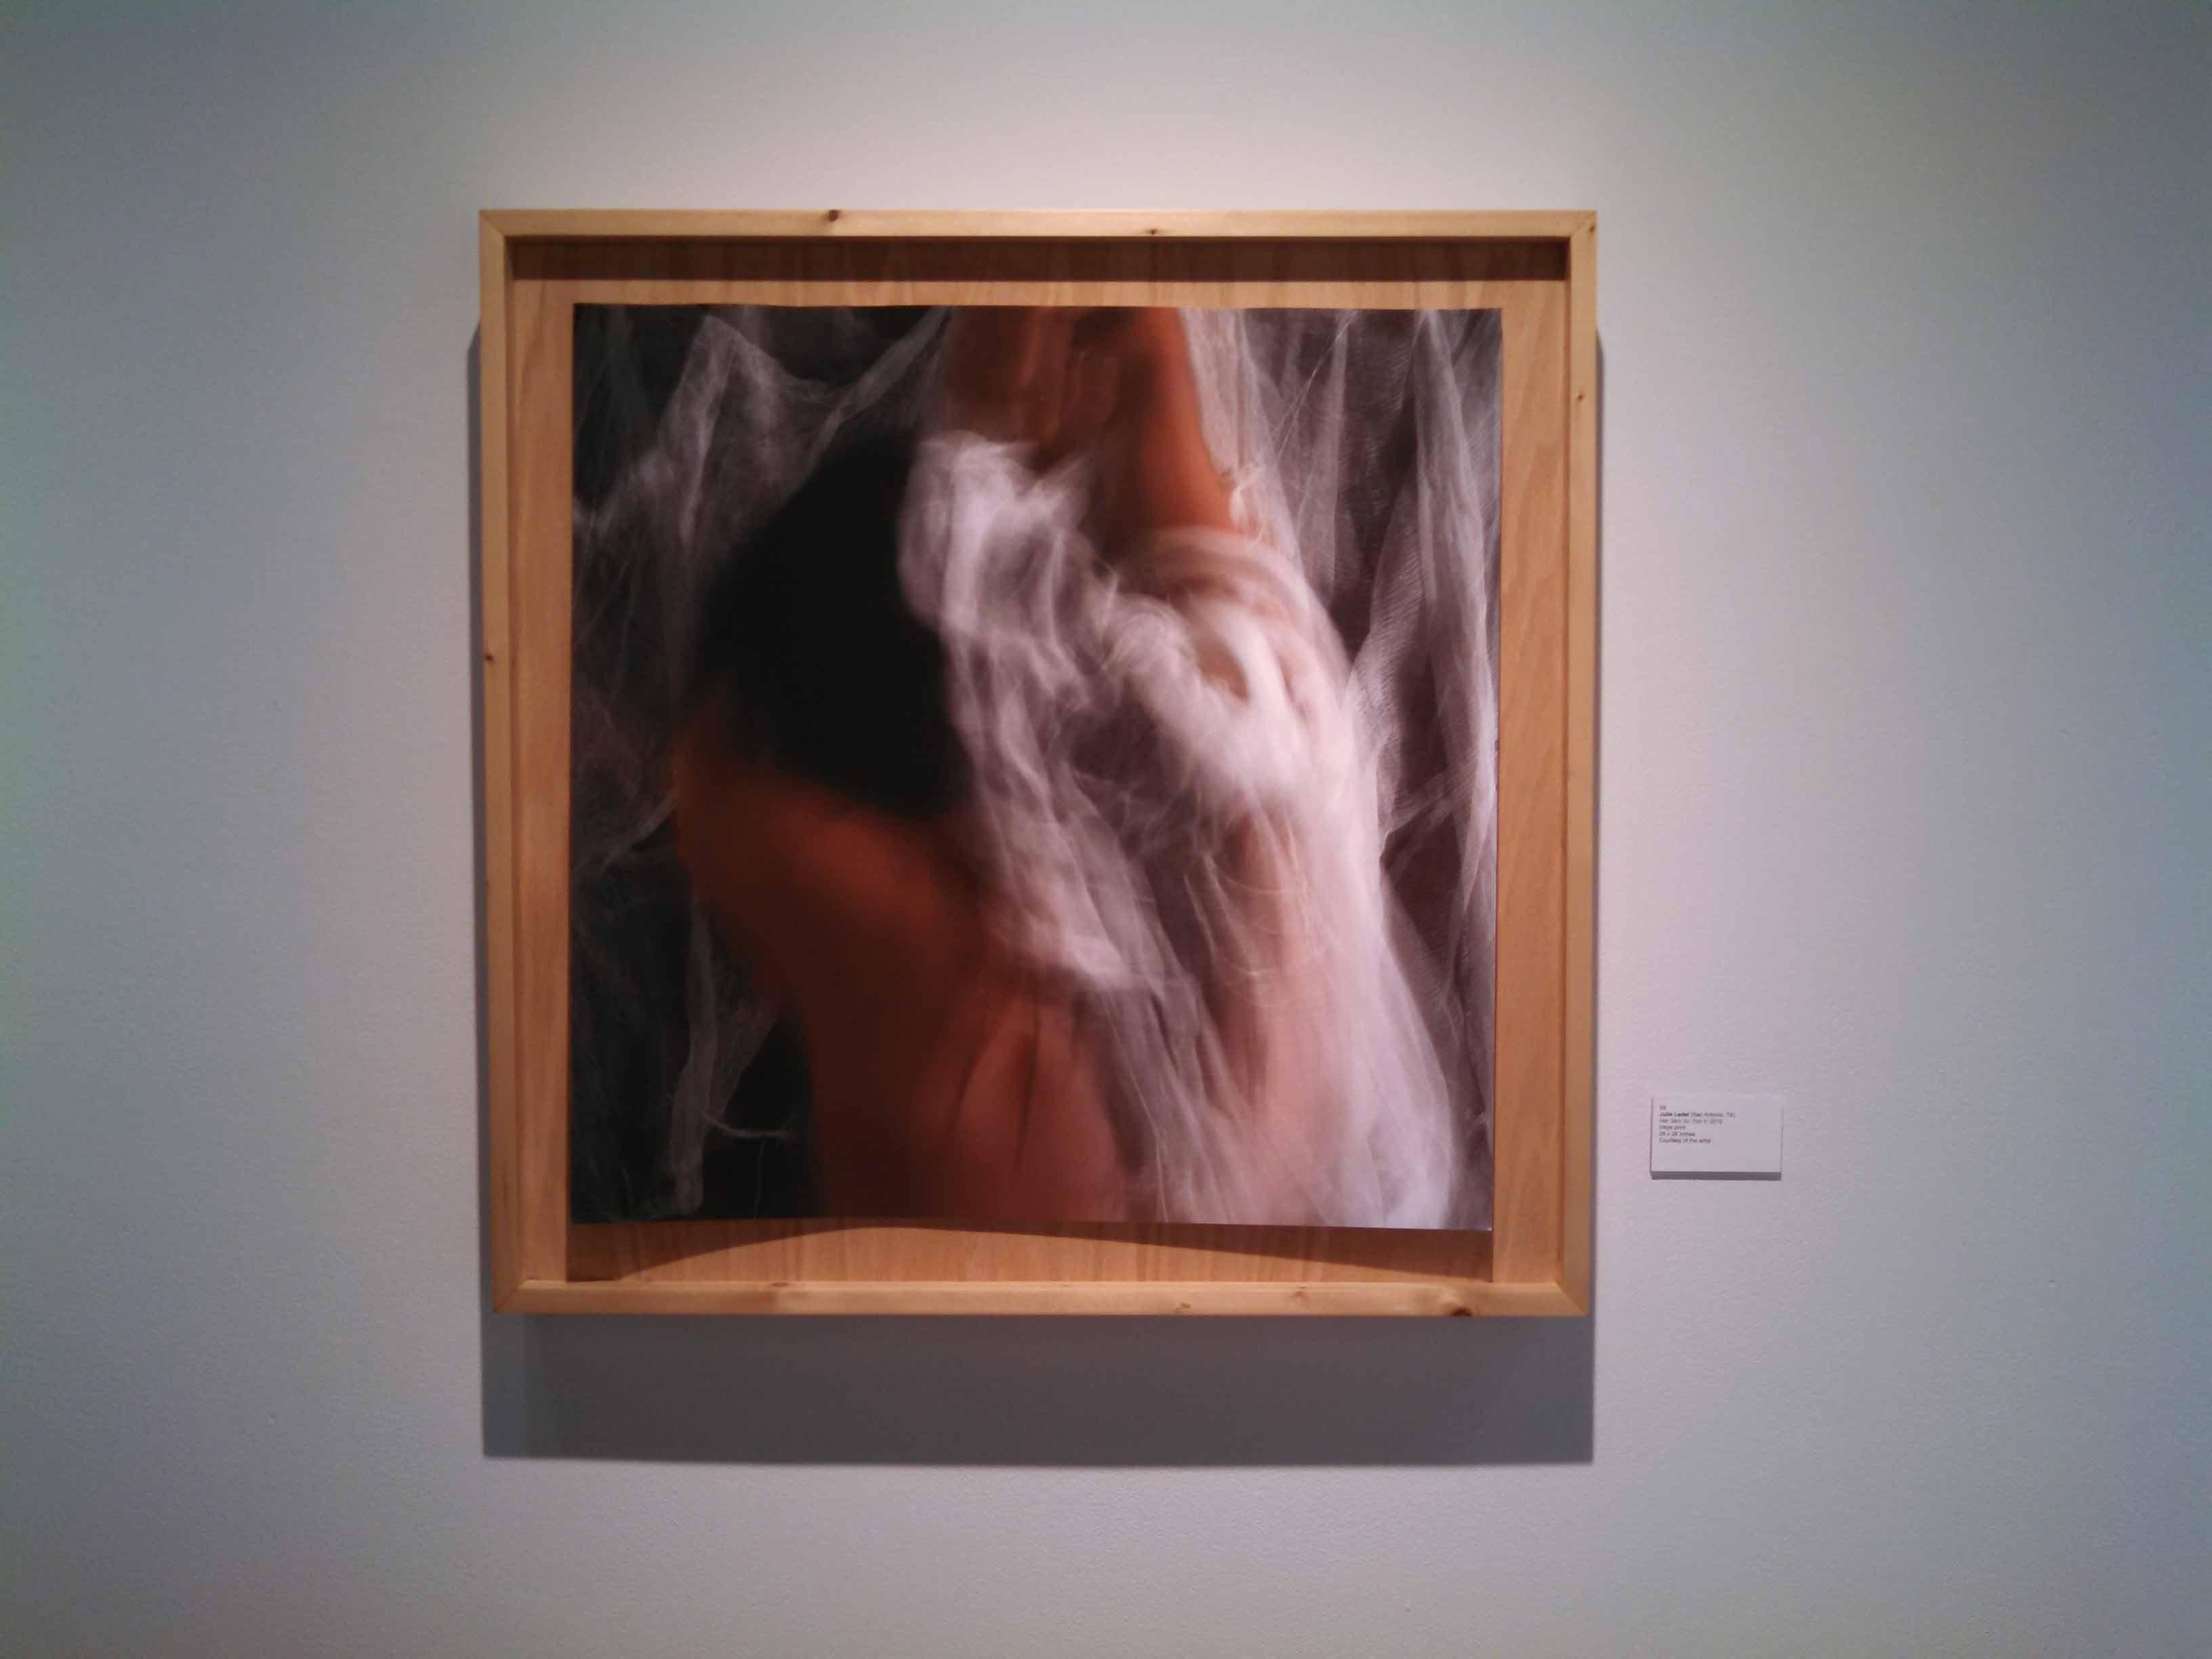 Her-Skin-So-Thin-by-Julie-Ledet